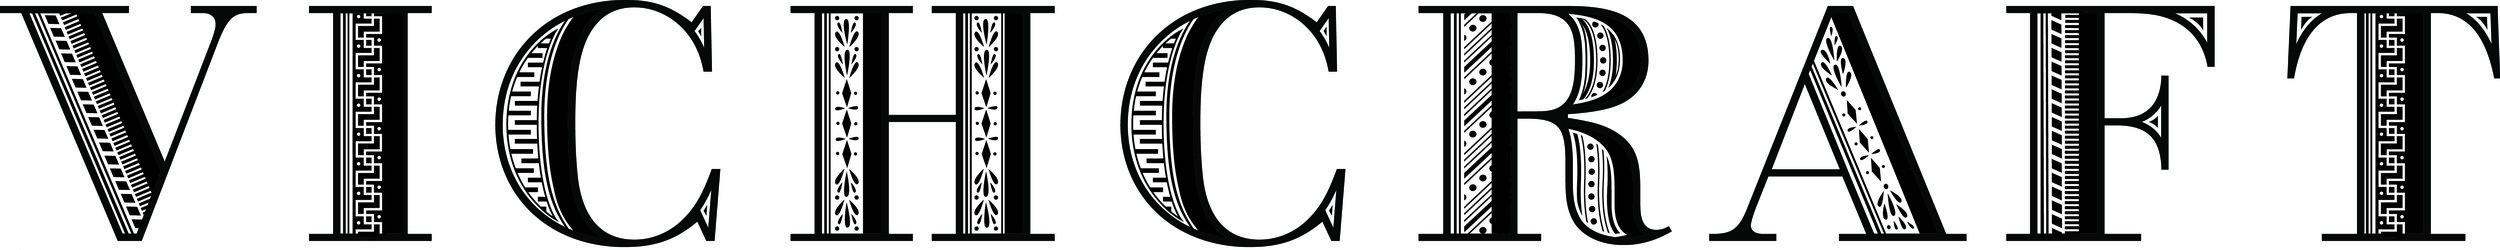 1.7_vichcraft_logotype_010915.jpg